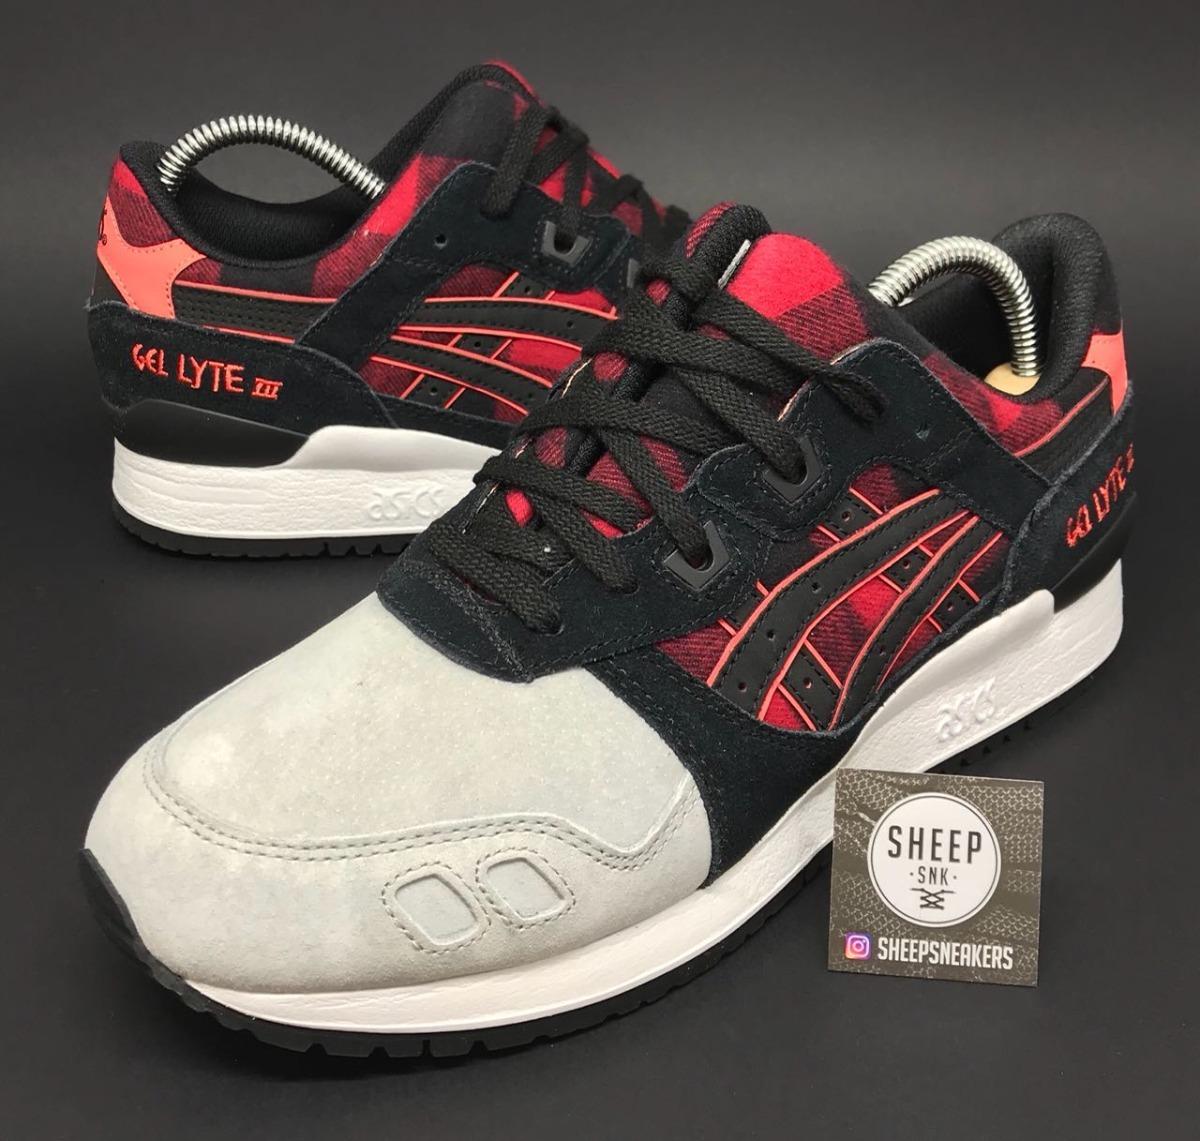 88c1f67ea6711 tênis asics gel lyte iii original runner retro estilo. Carregando zoom.